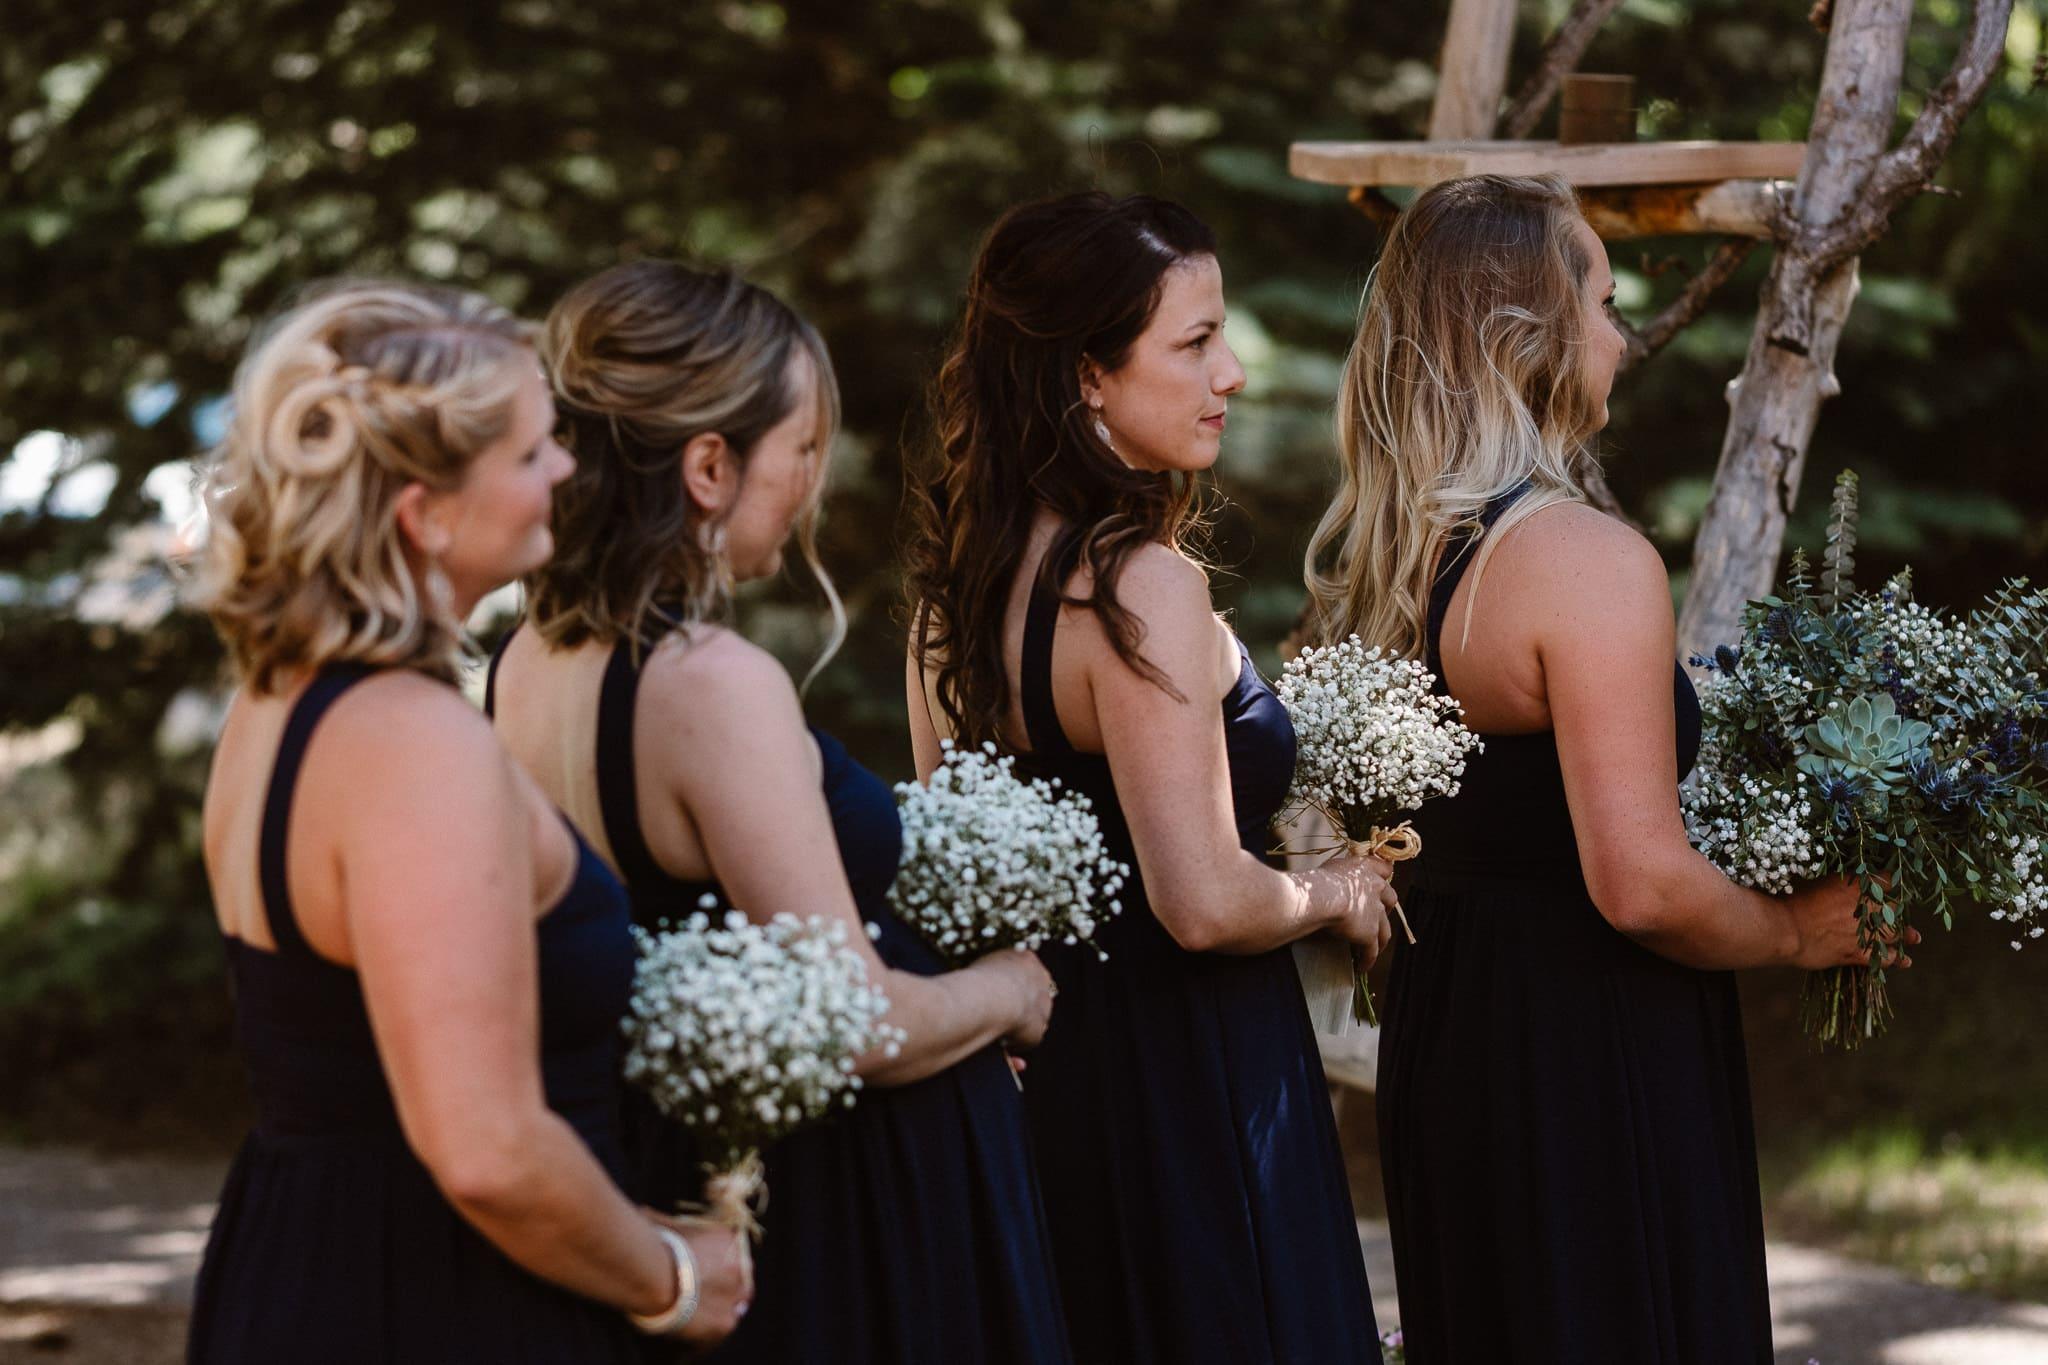 Redstone Inn wedding photographer, Carbondale wedding photographer, Colorado intimate wedding photographer, wedding ceremony, bridesmaids in dark purple dresses